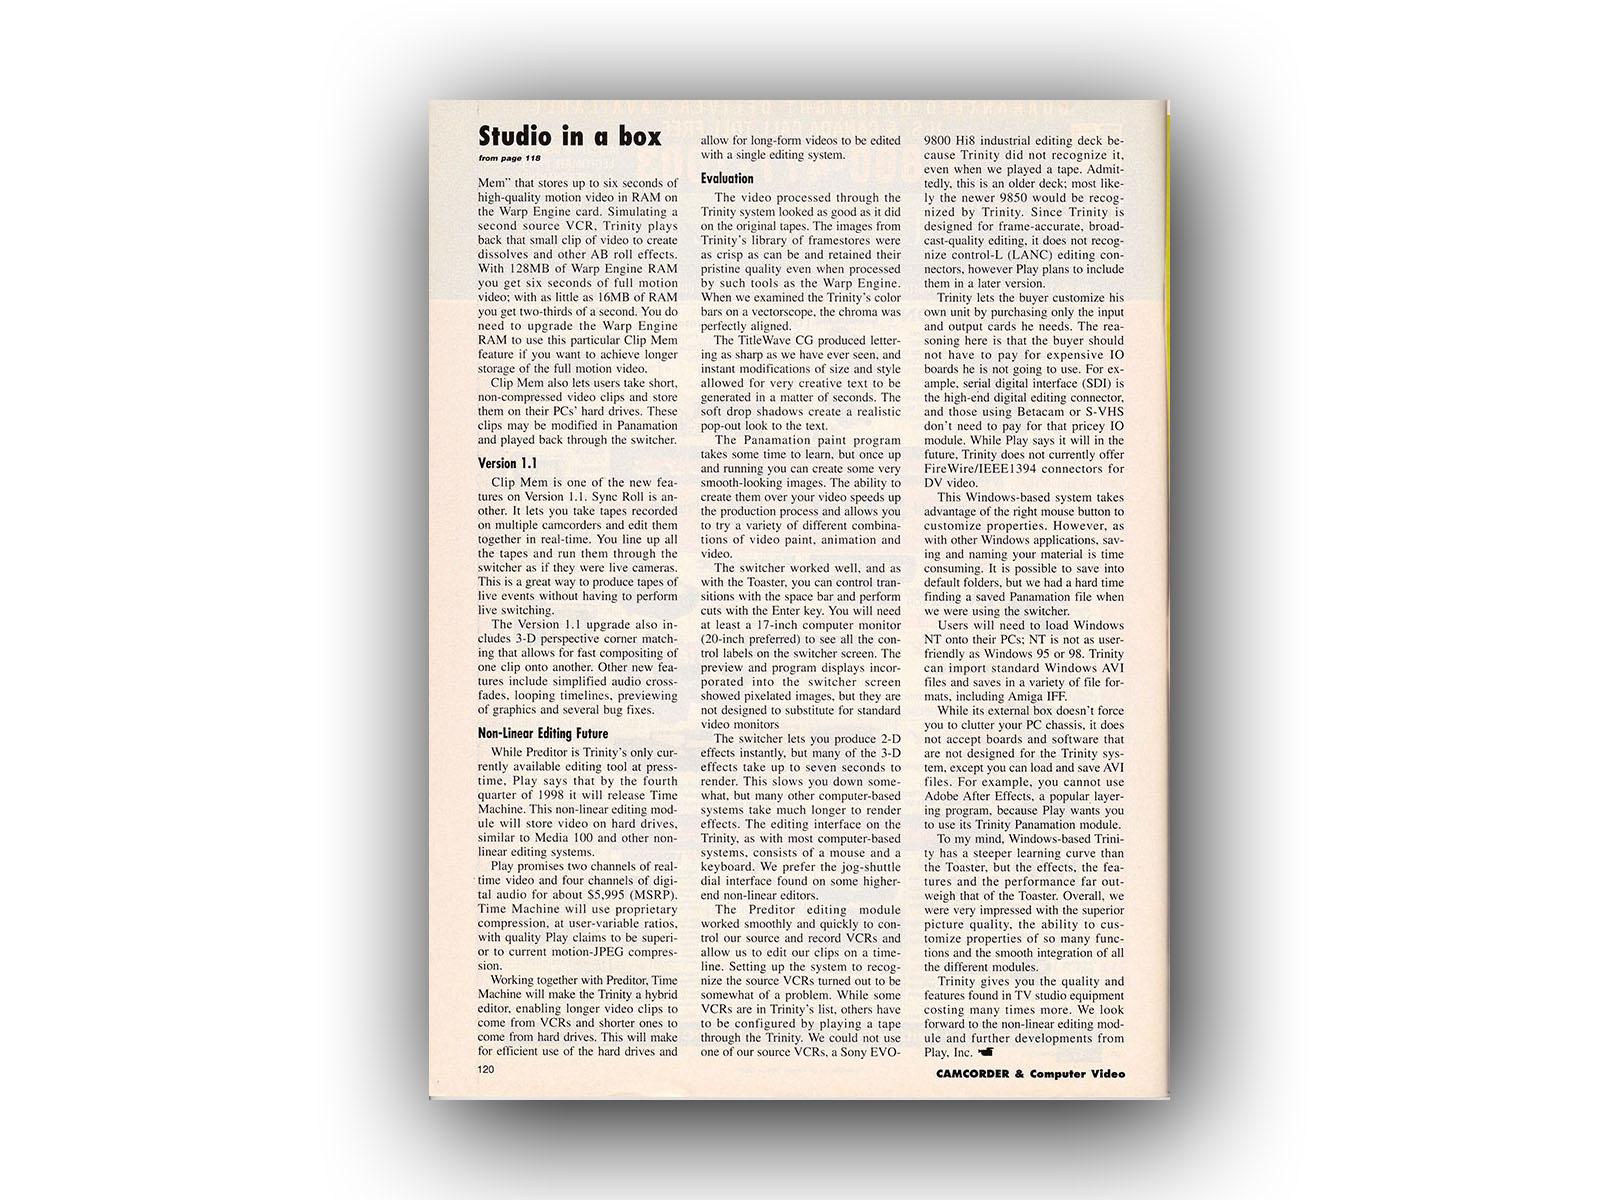 _0014_MagazineCamcorderCompuerVideo-Dec98-P120_web.jpg